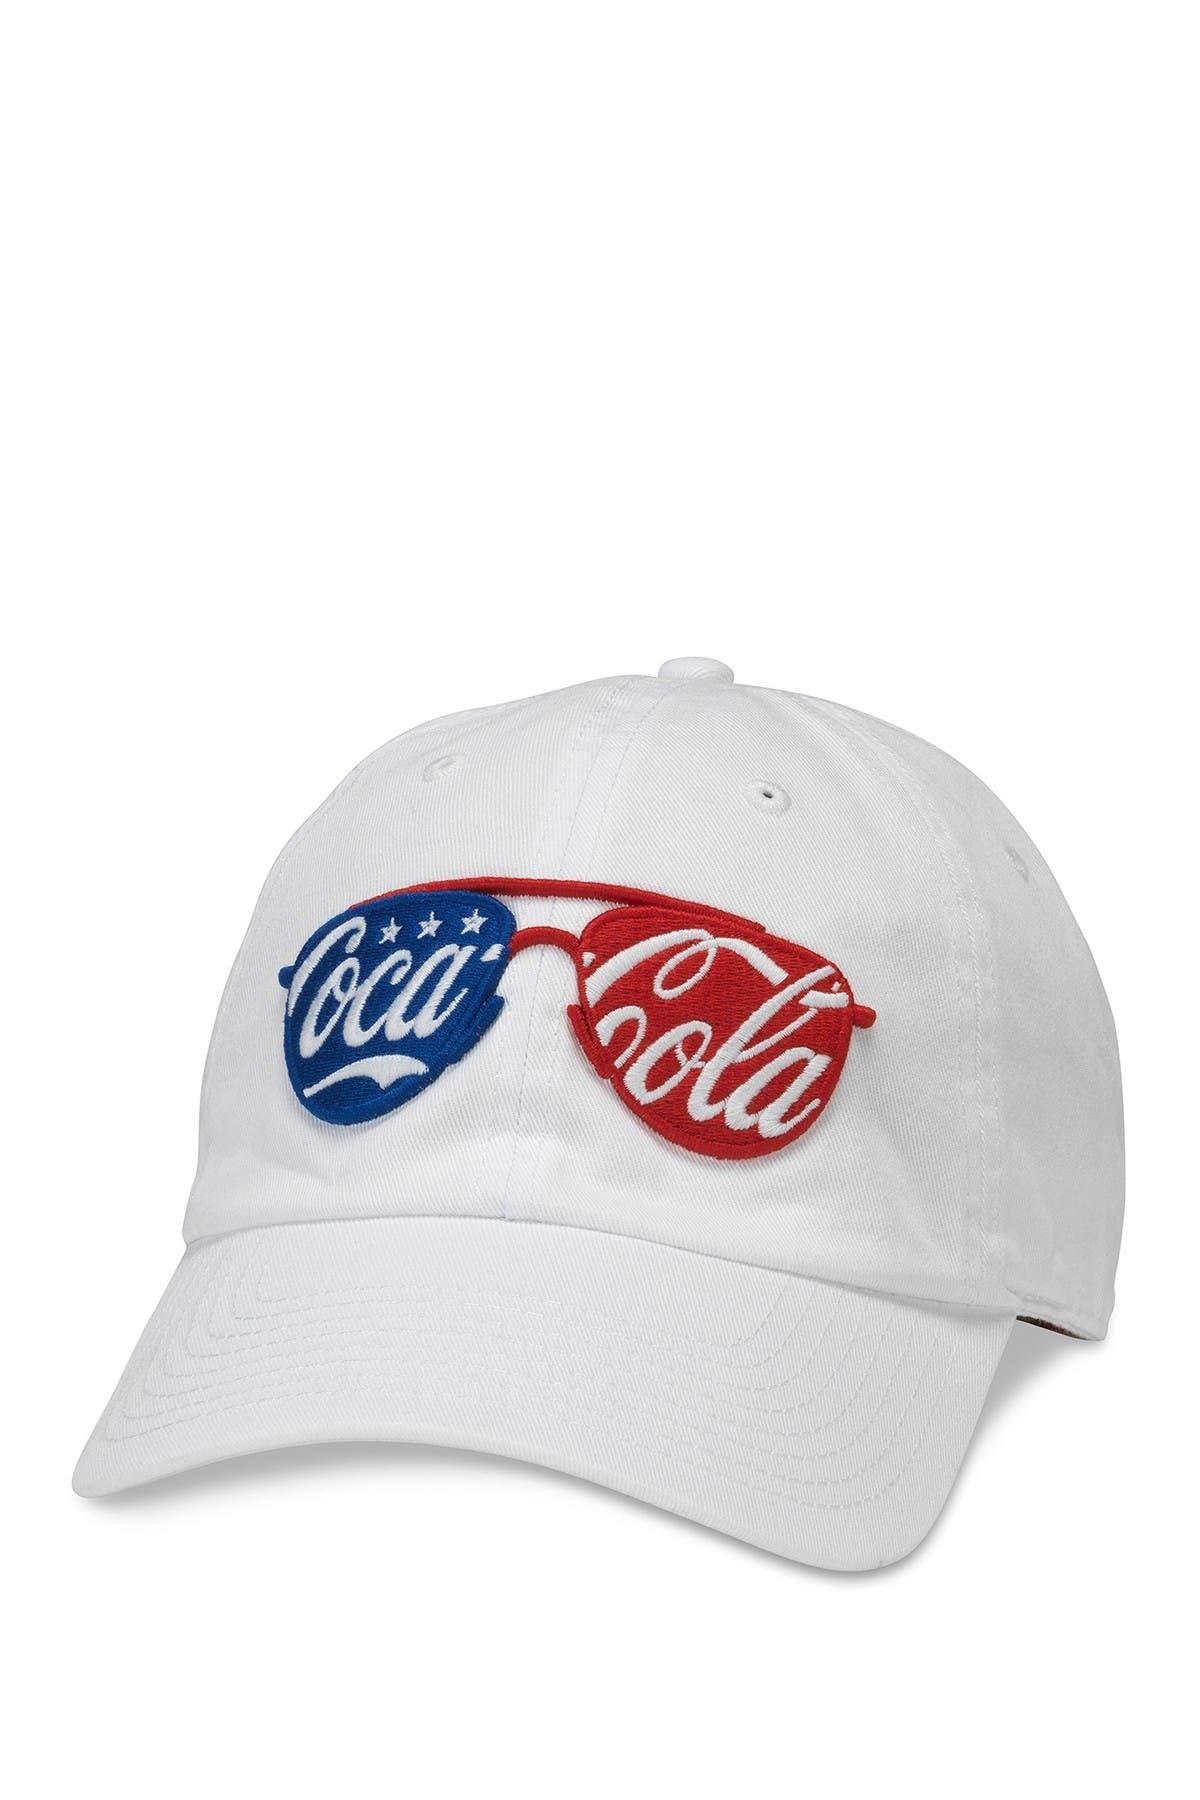 Image of American Needle Coke USA Sunglasses Baseball Hat